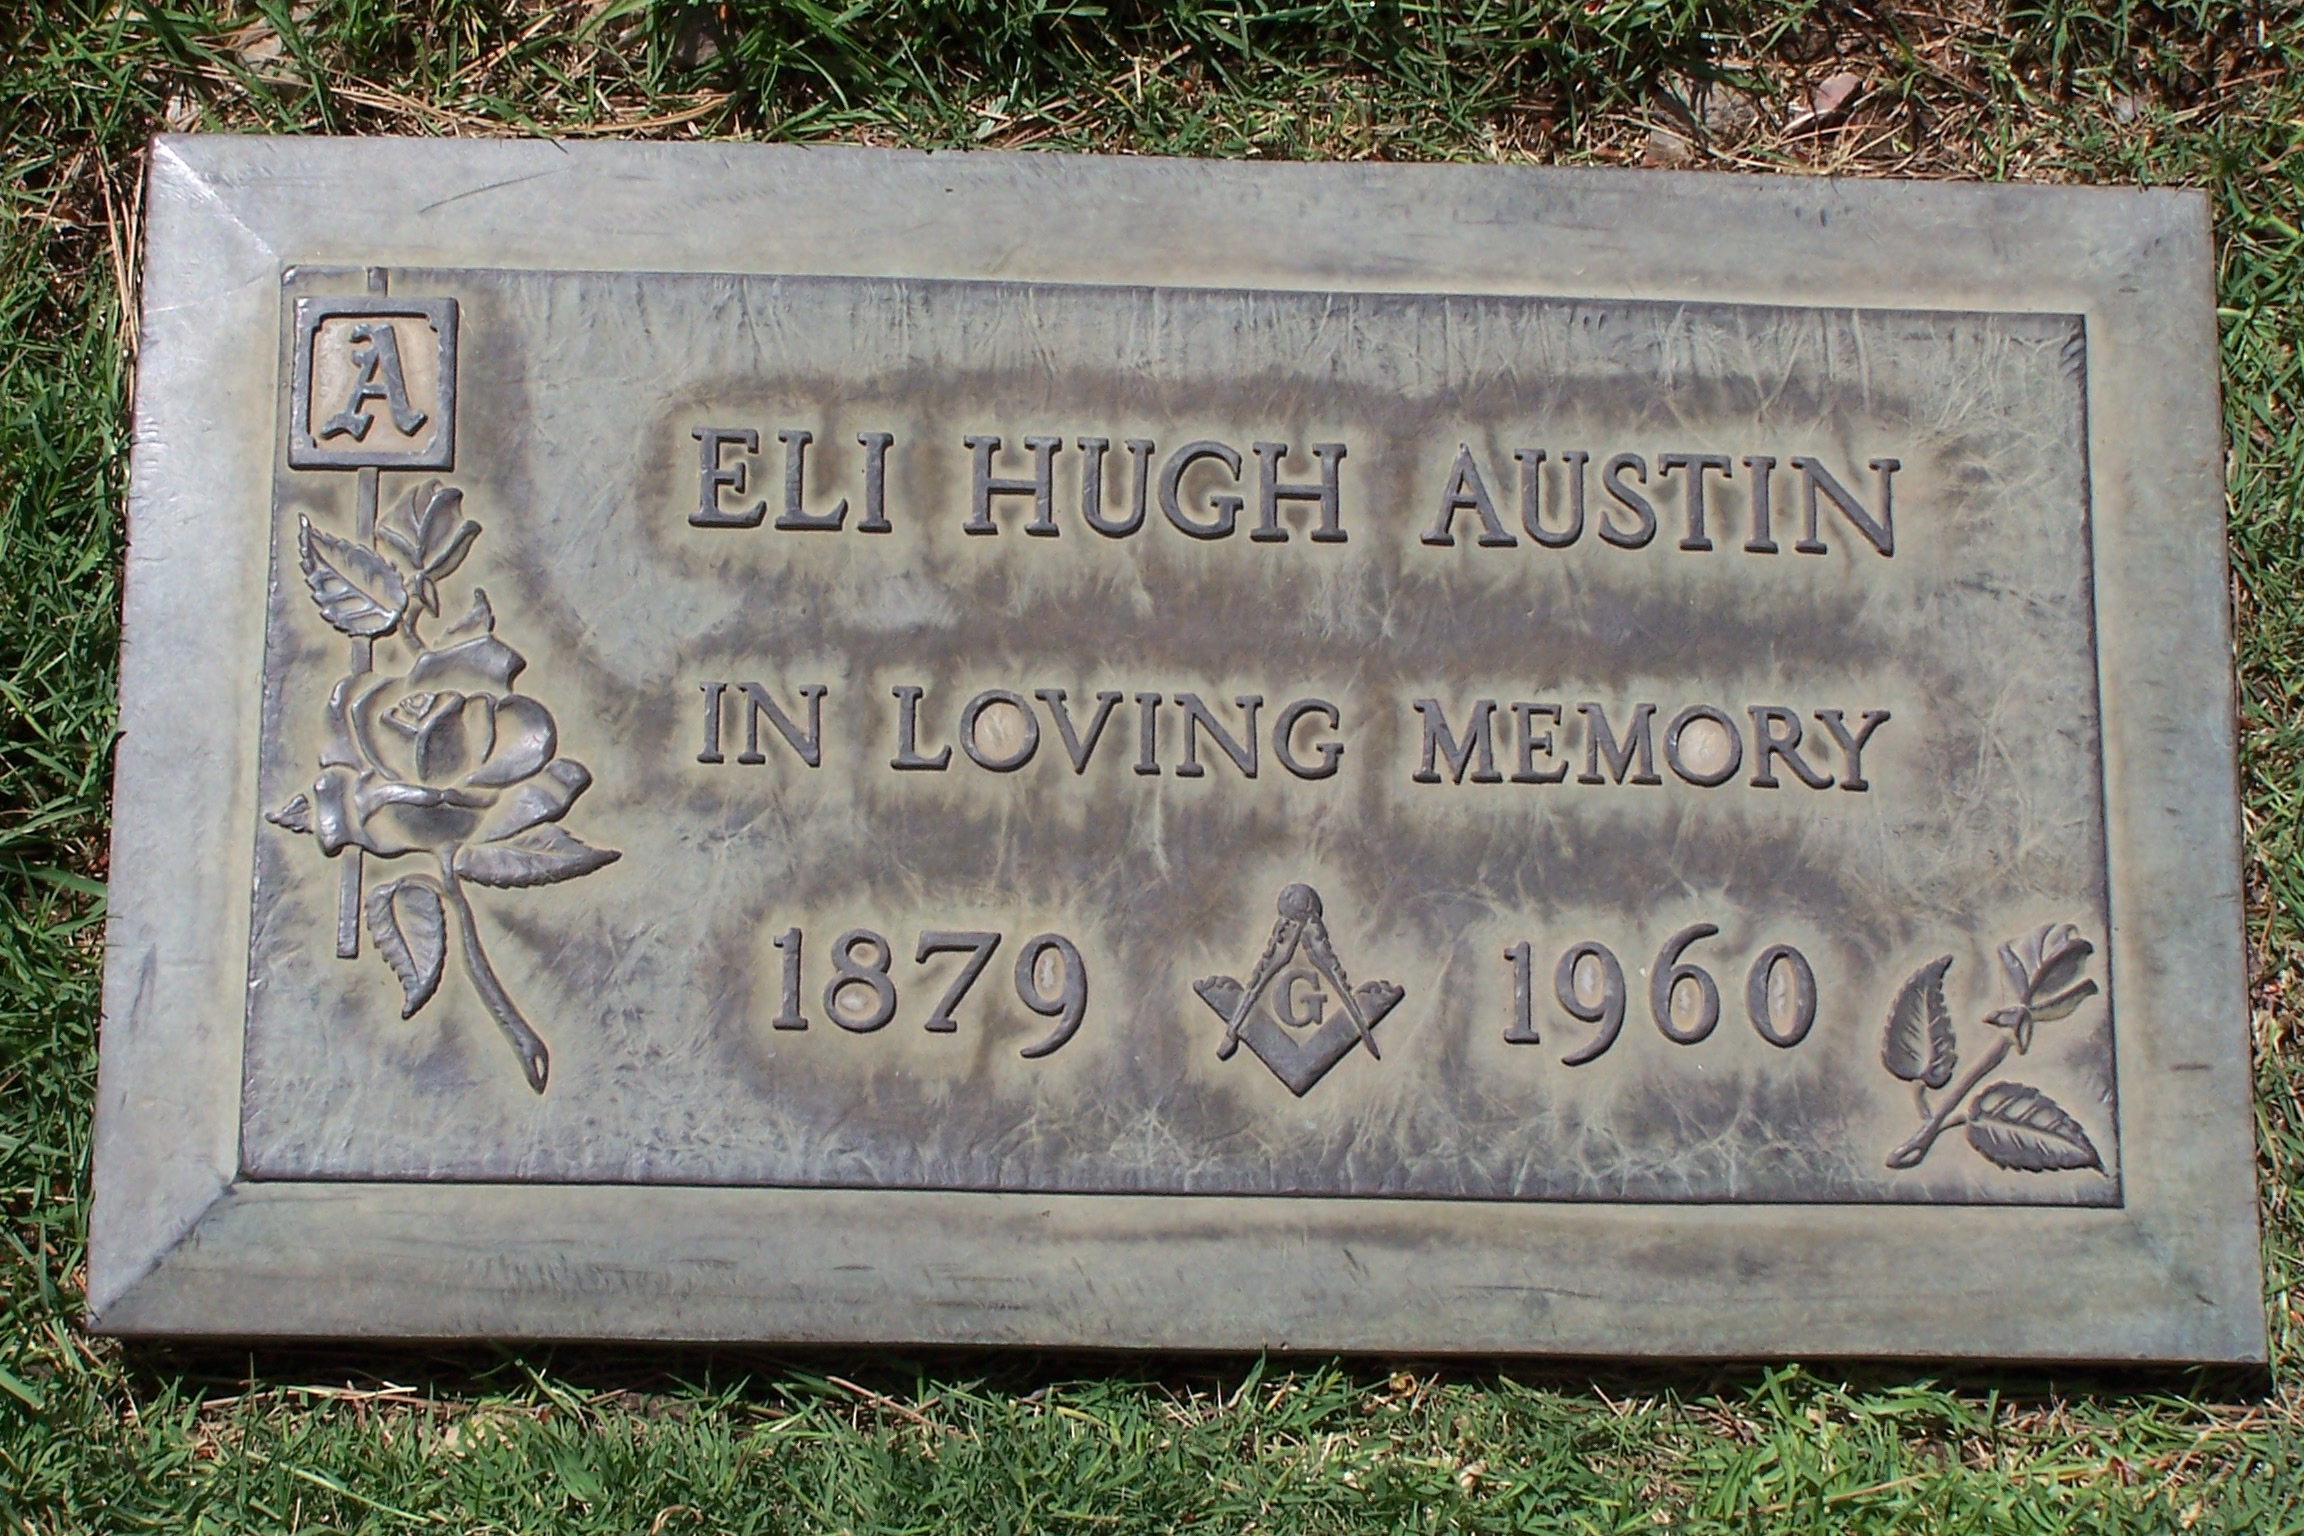 Eli Hugh Austin